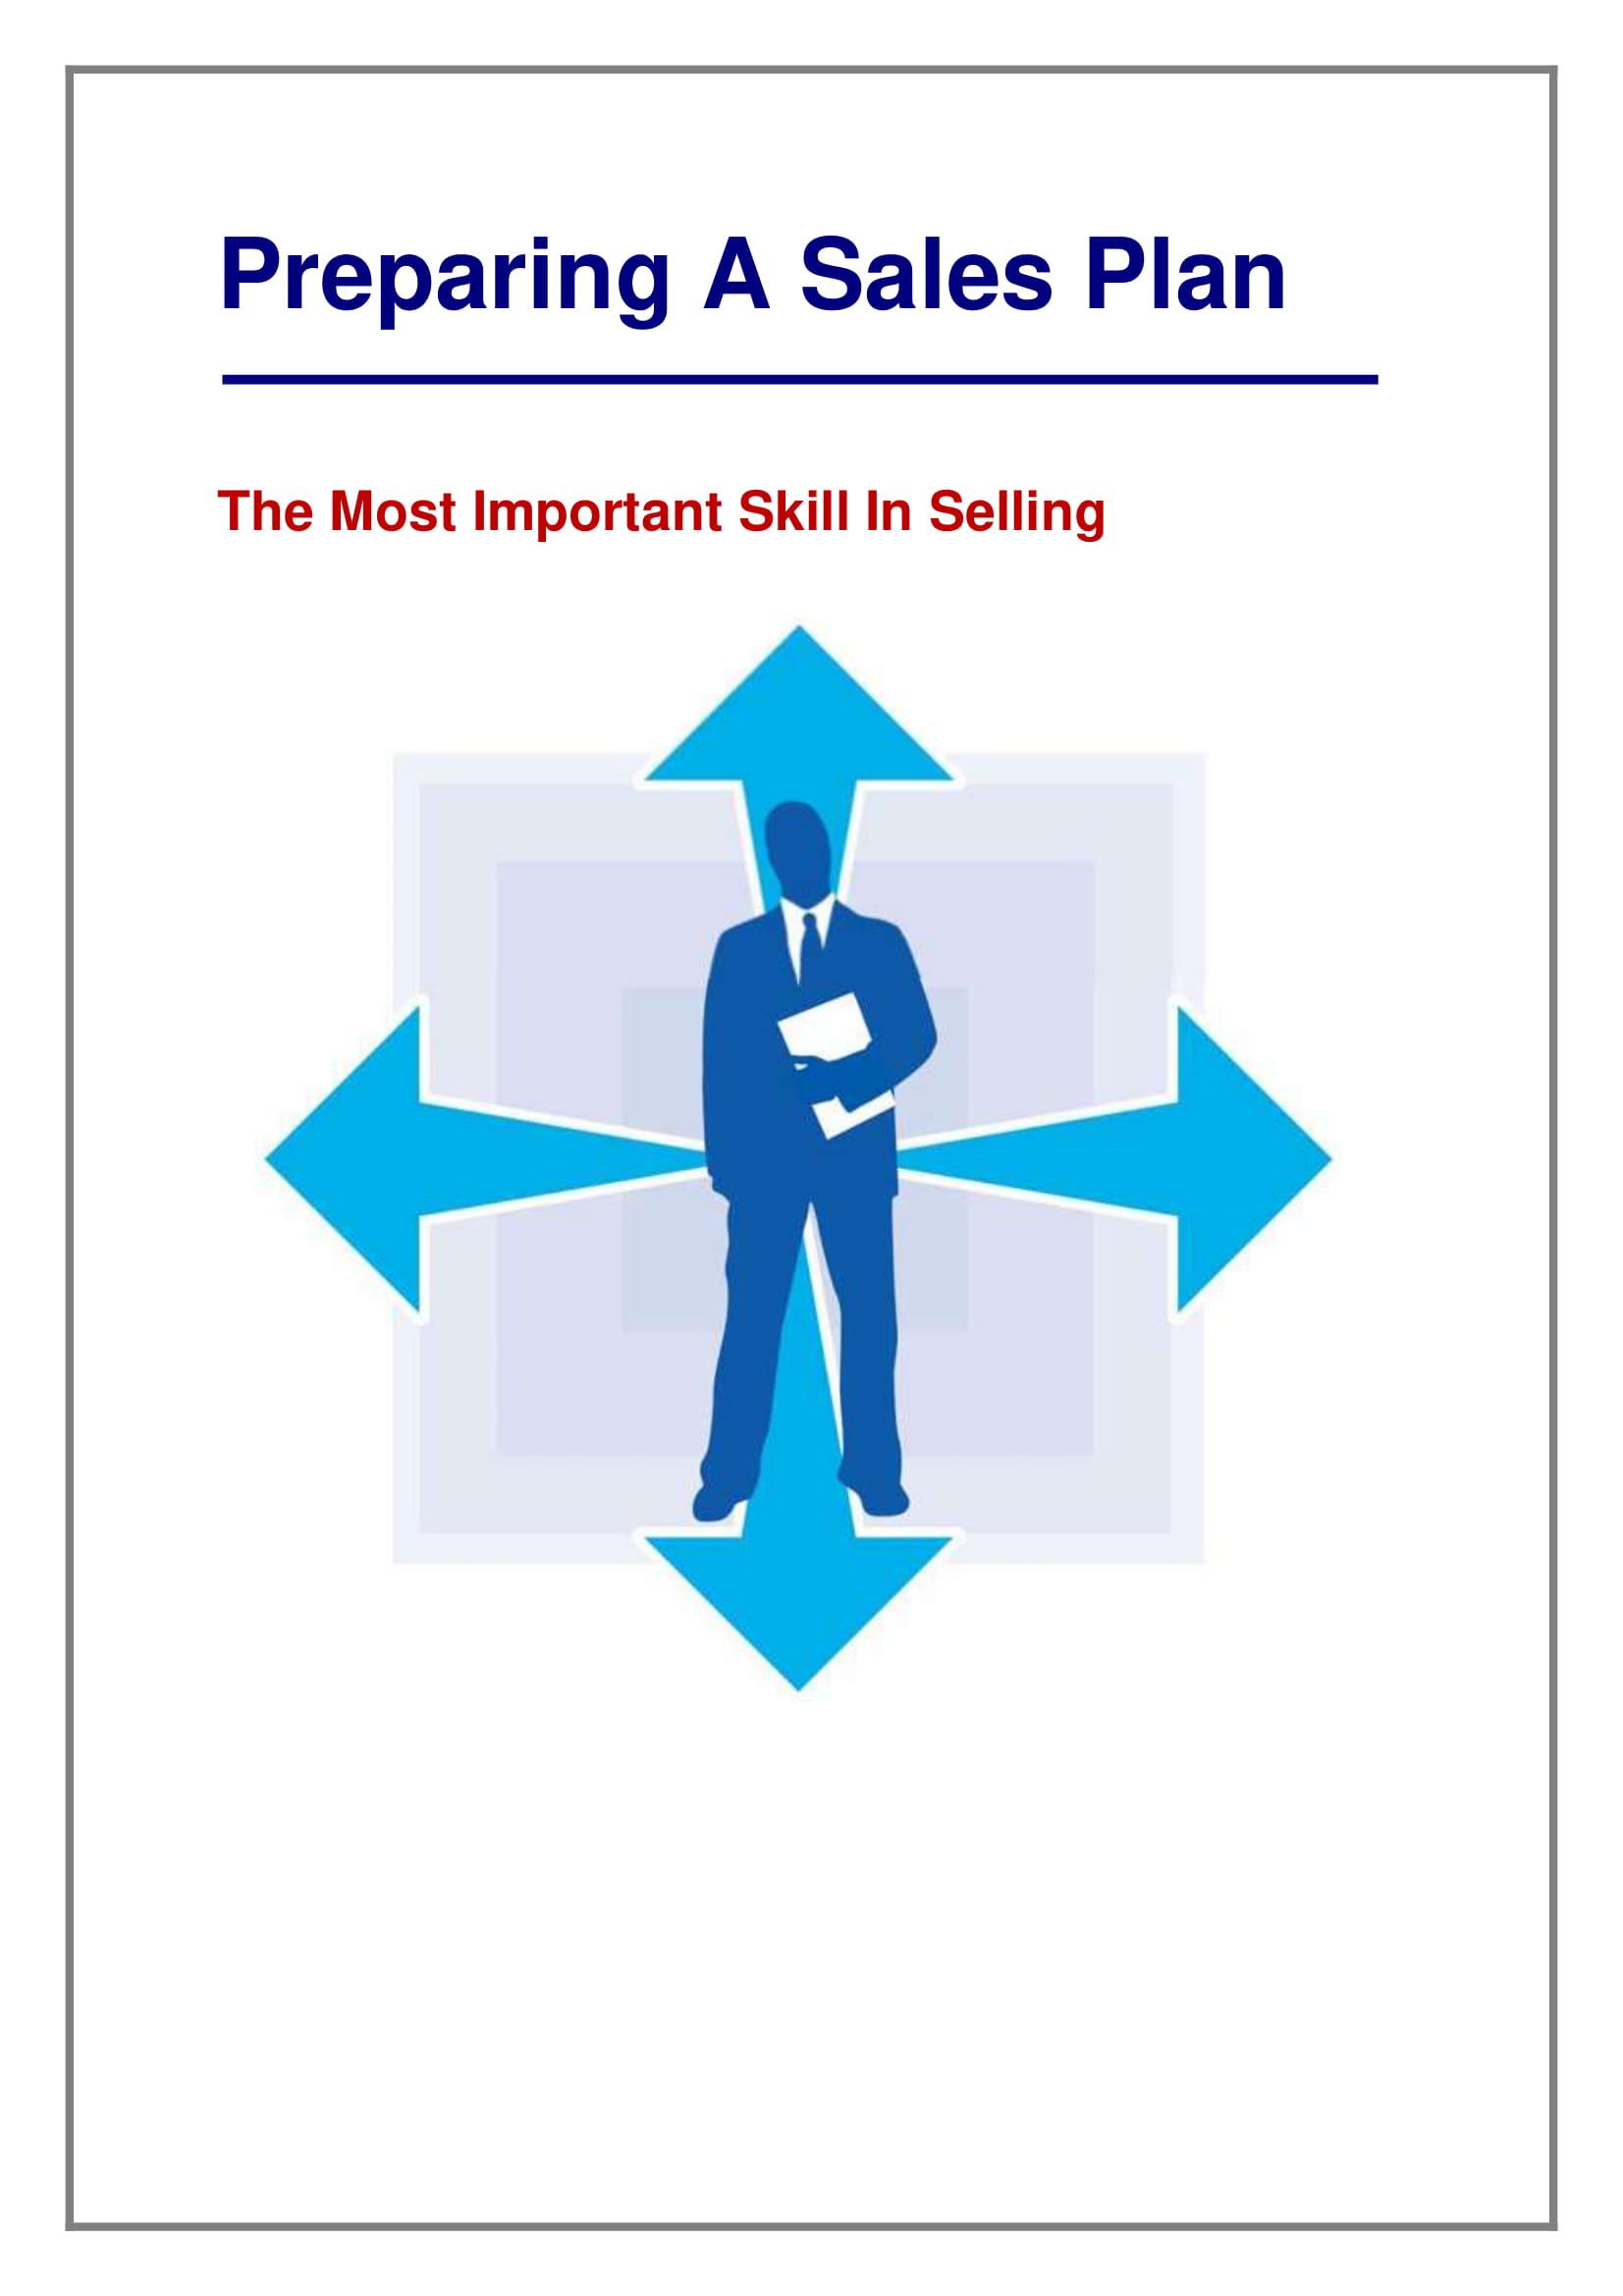 sales plan strategic preparation example 1